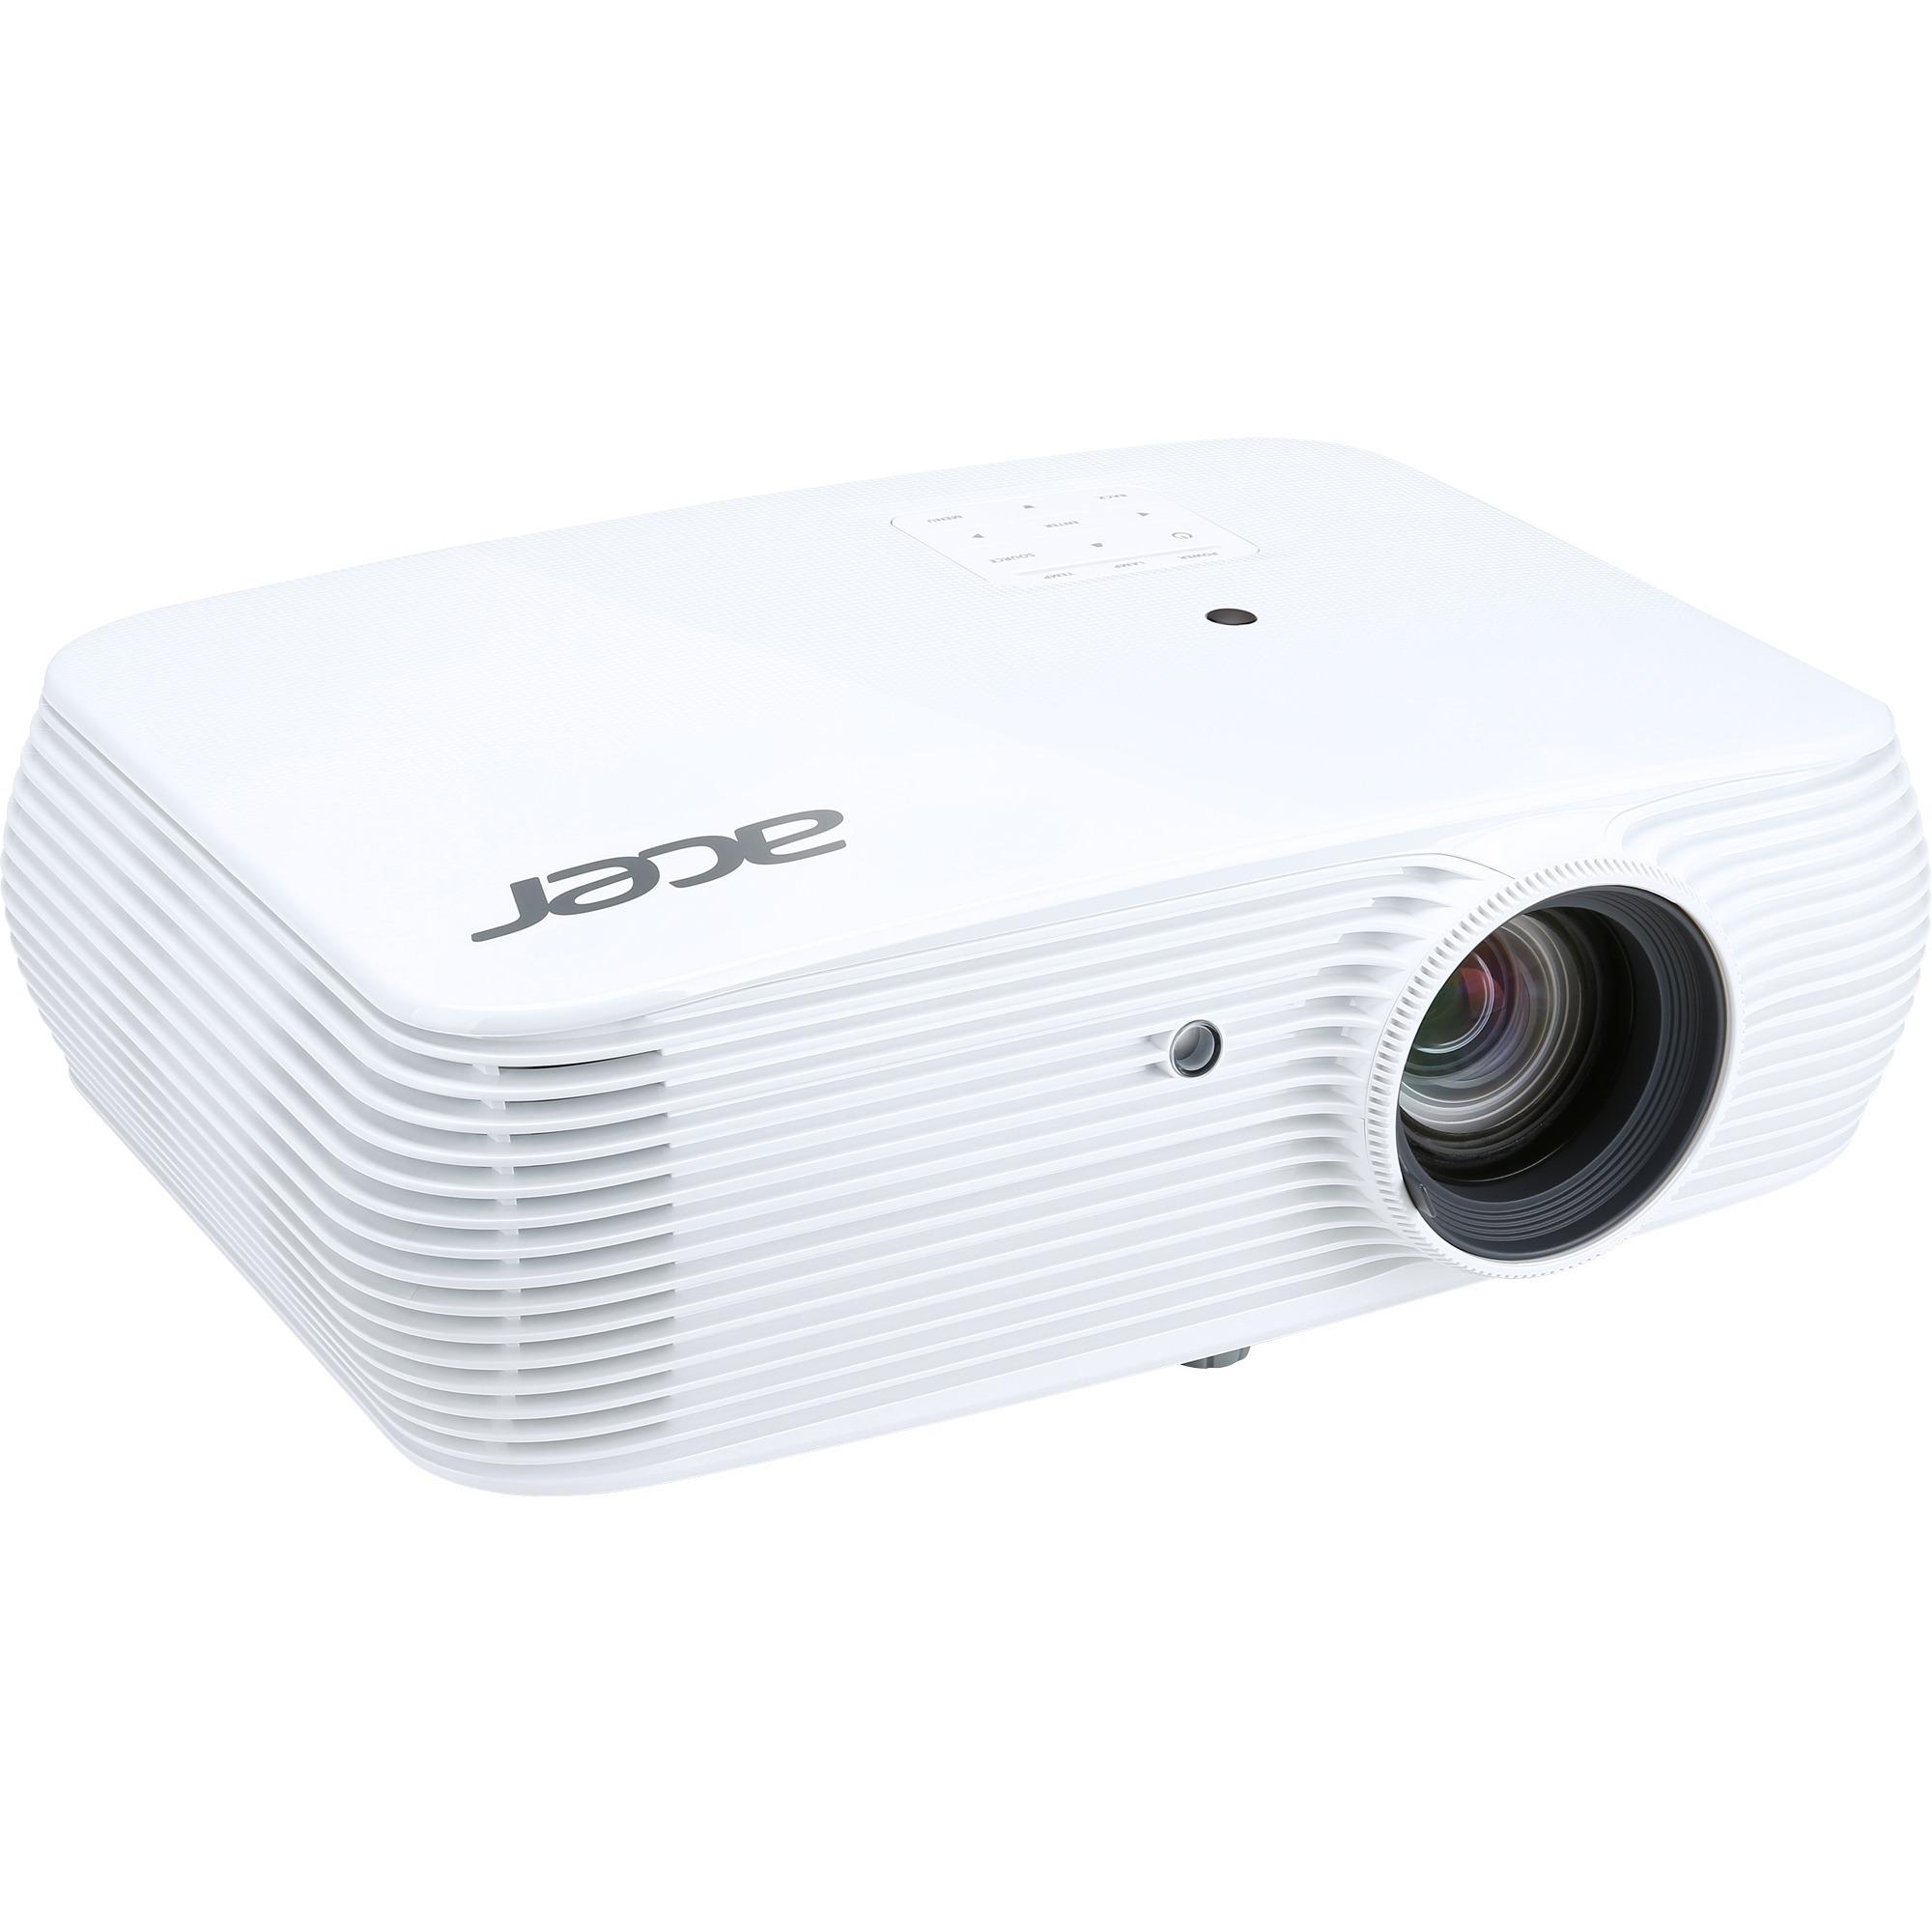 Business P5530 videoproyector 4000 lúmenes ANSI DLP 1080p (1920x1080) 3D Proyector para montar en pared Blanco, Proyector DLP